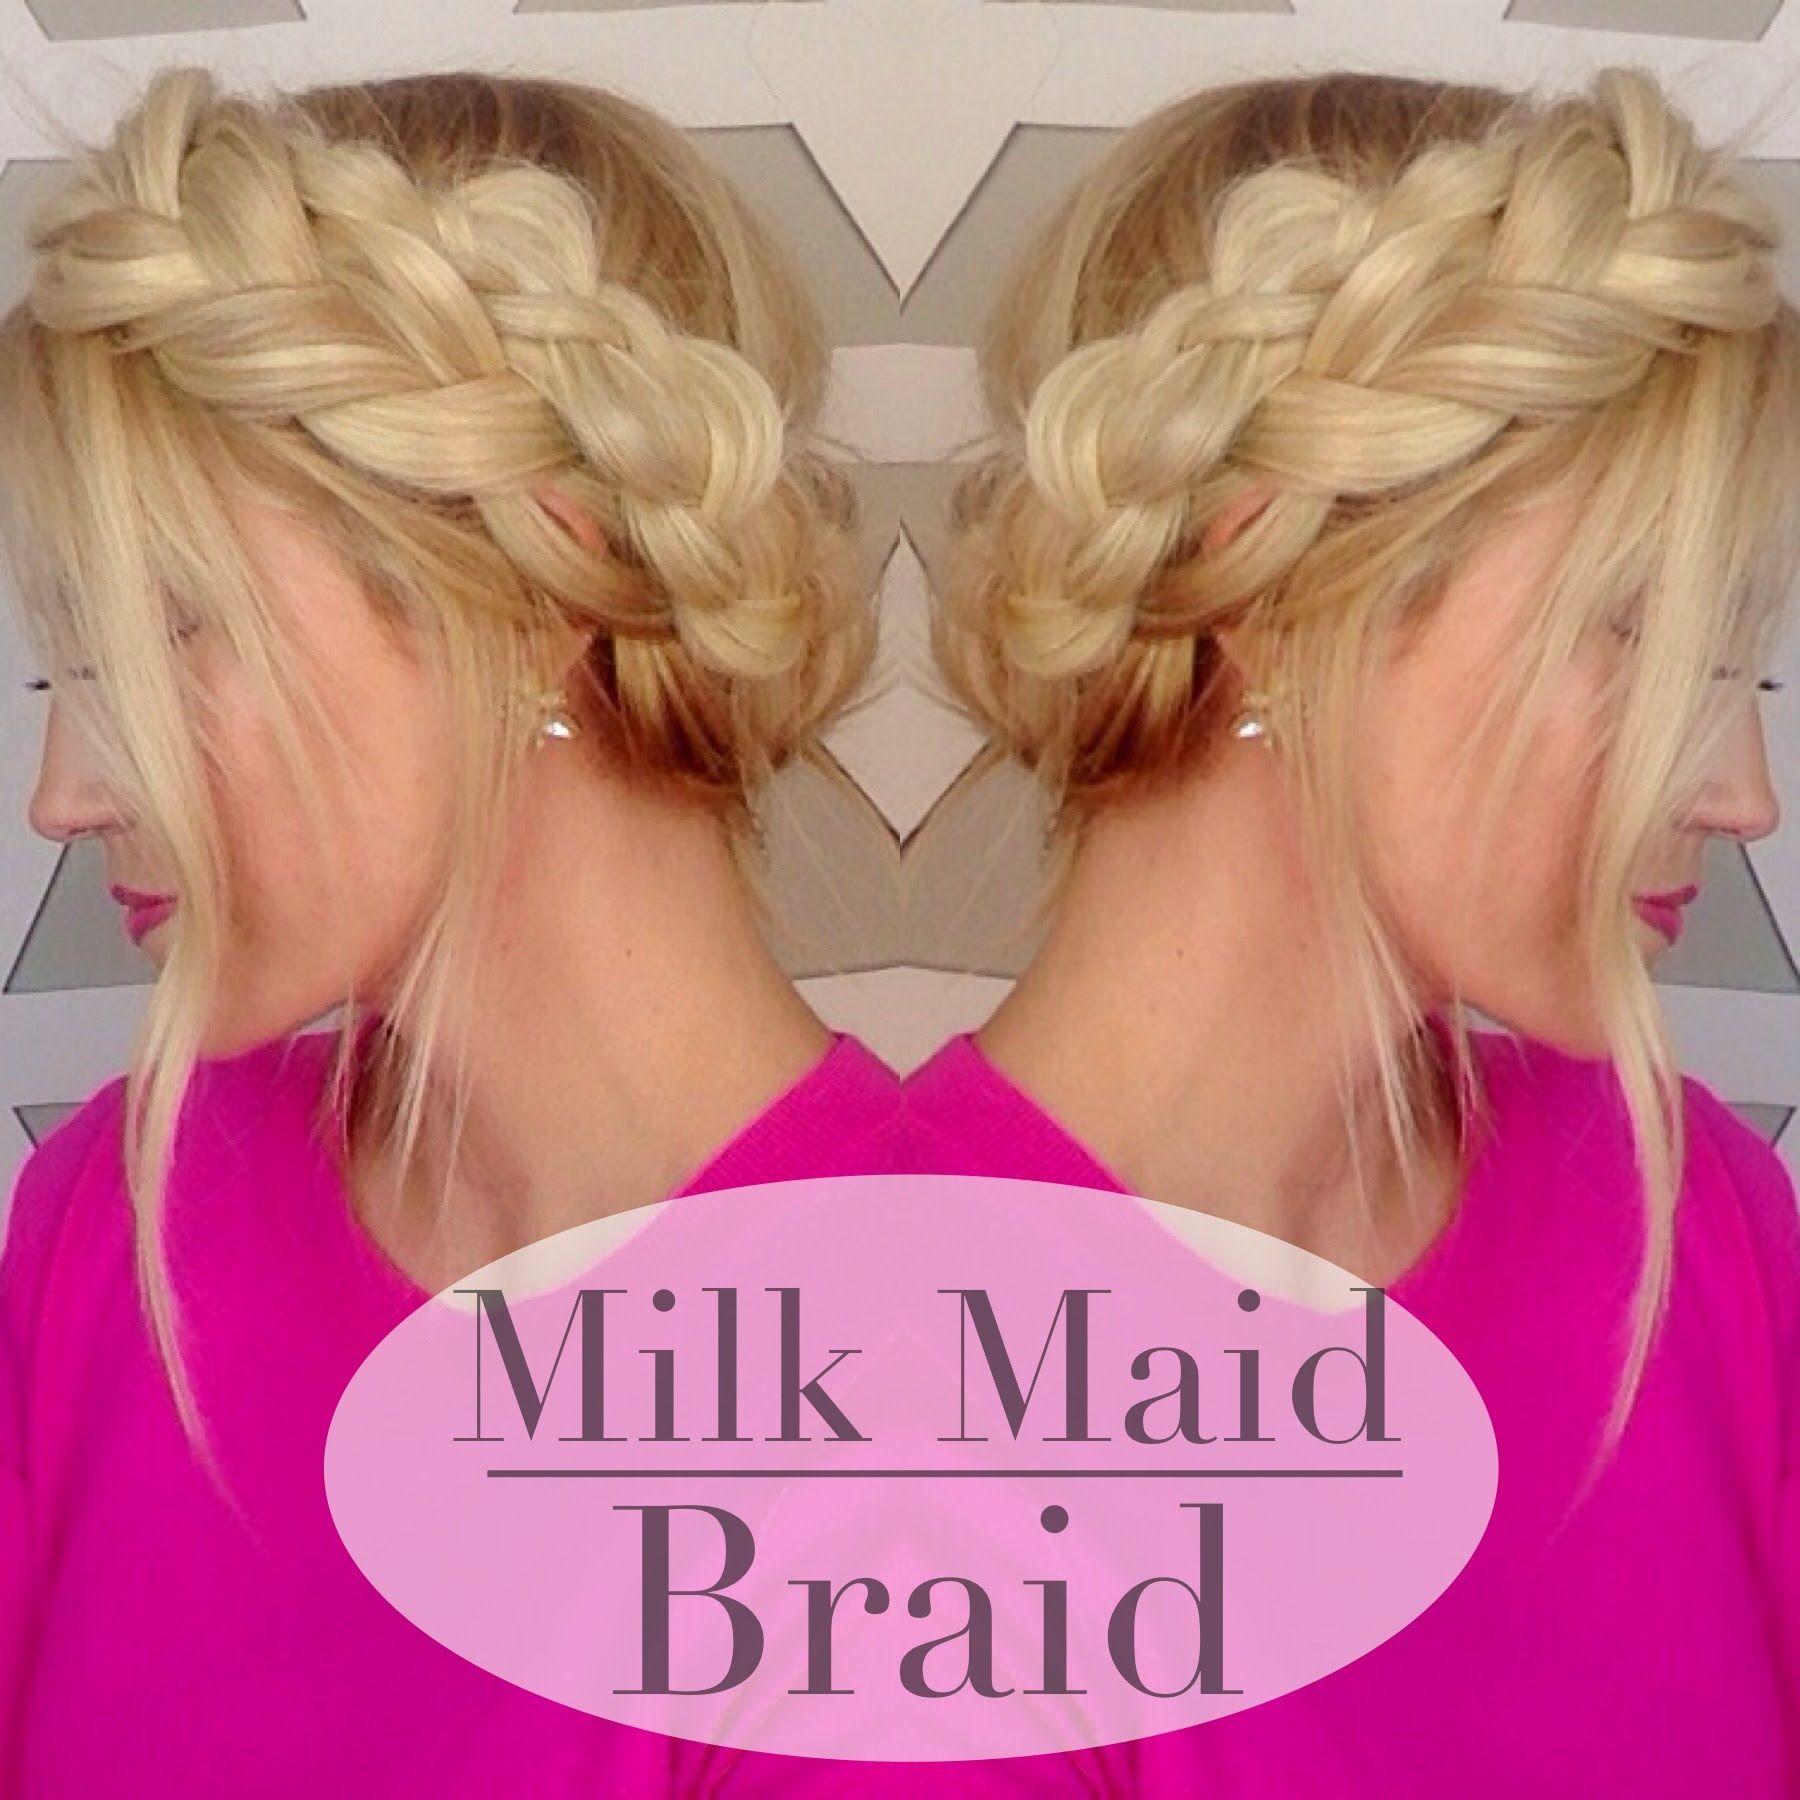 Bohemian Milk Maid Braid Tutorial For Spring 2 Ways To